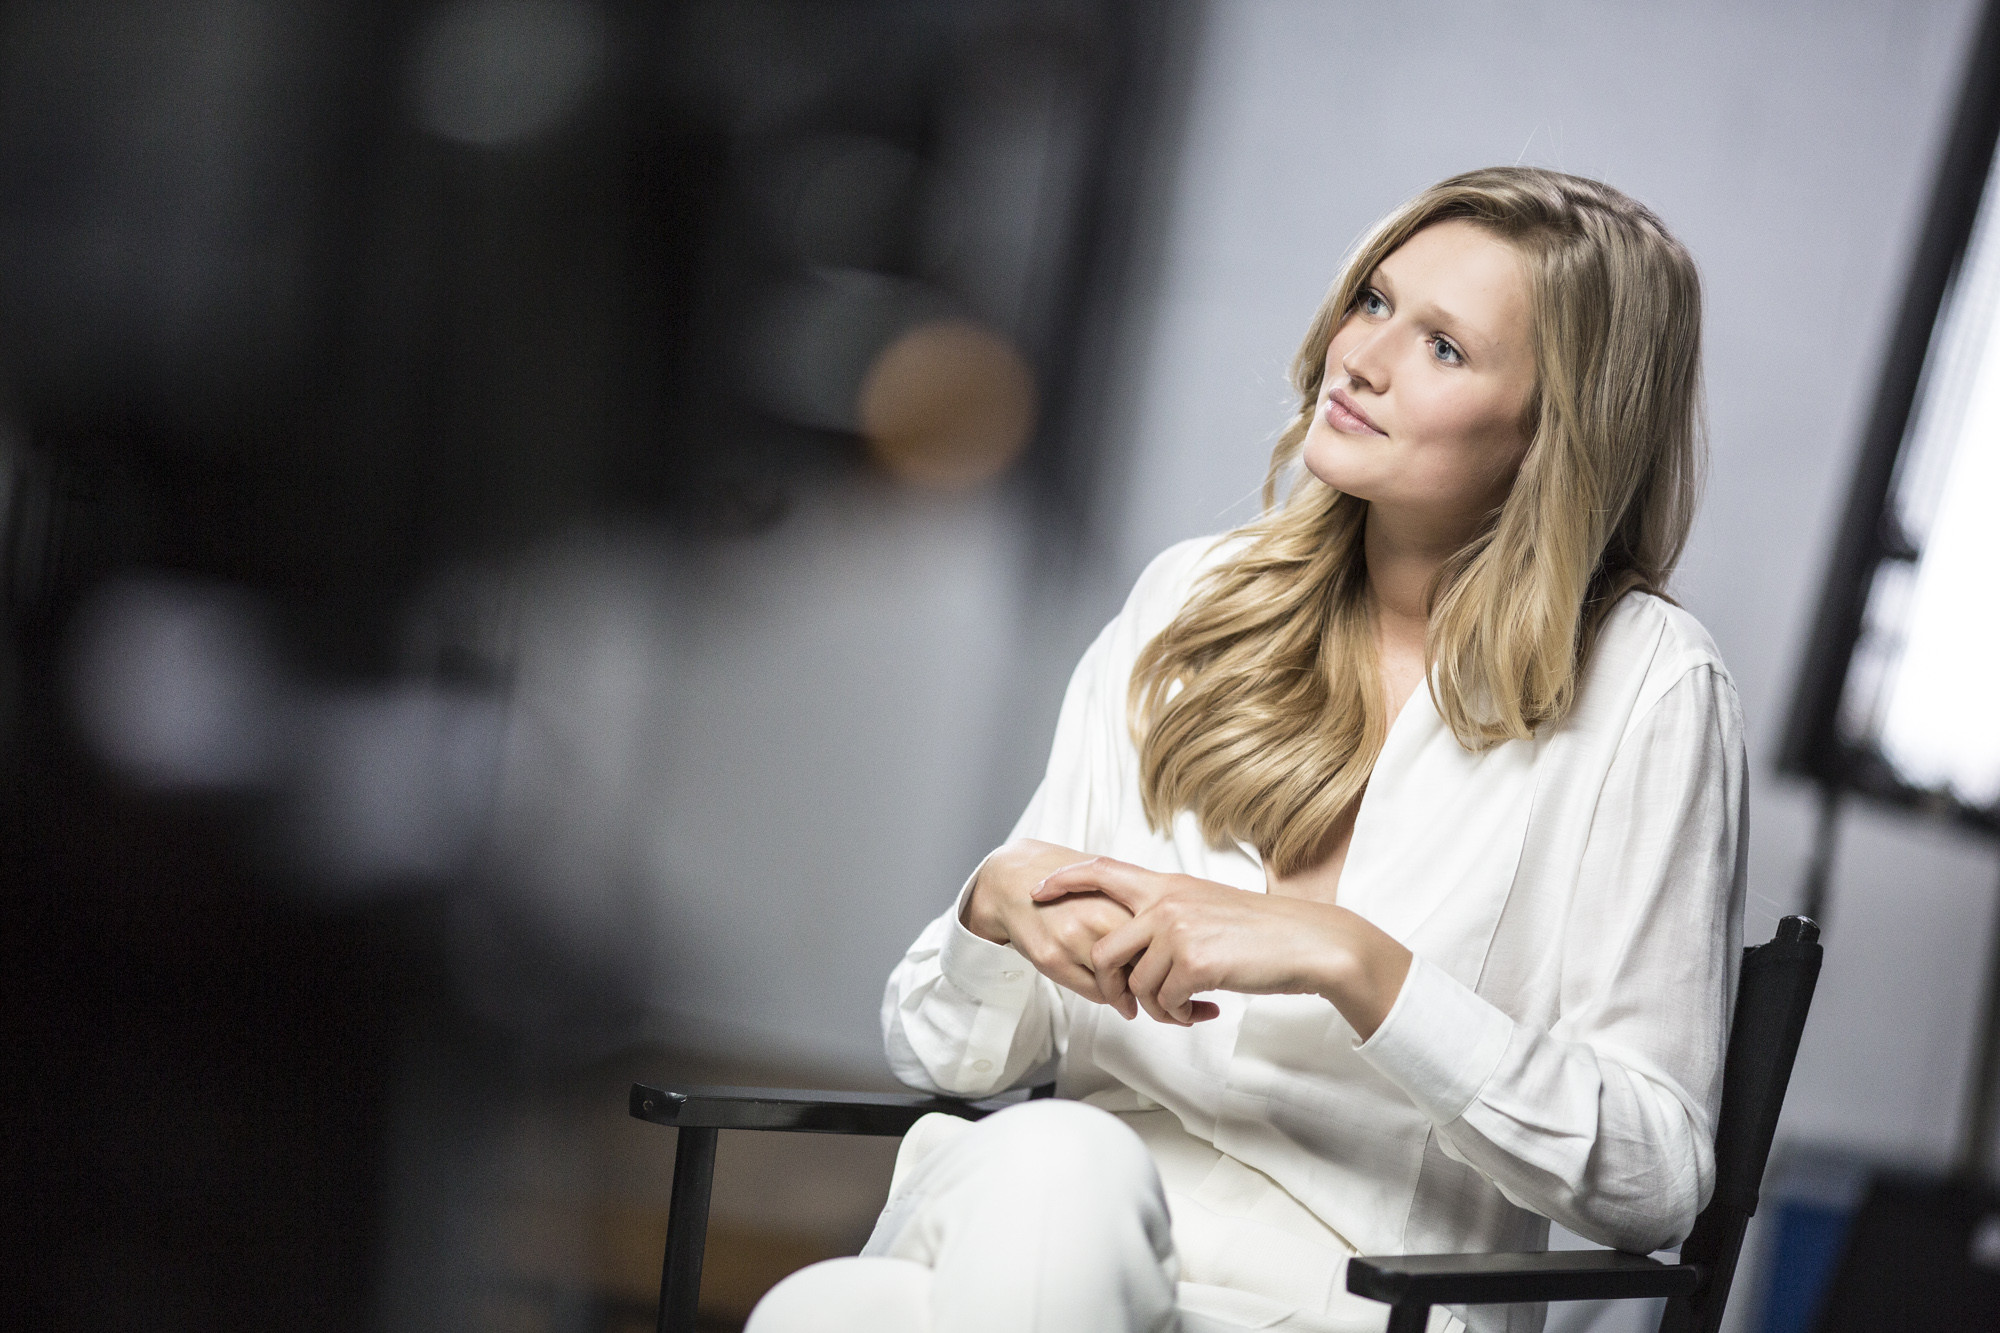 Kérastase Toni Garrn backstage - Very Personal Care for Exceptional Hair 5.jpg